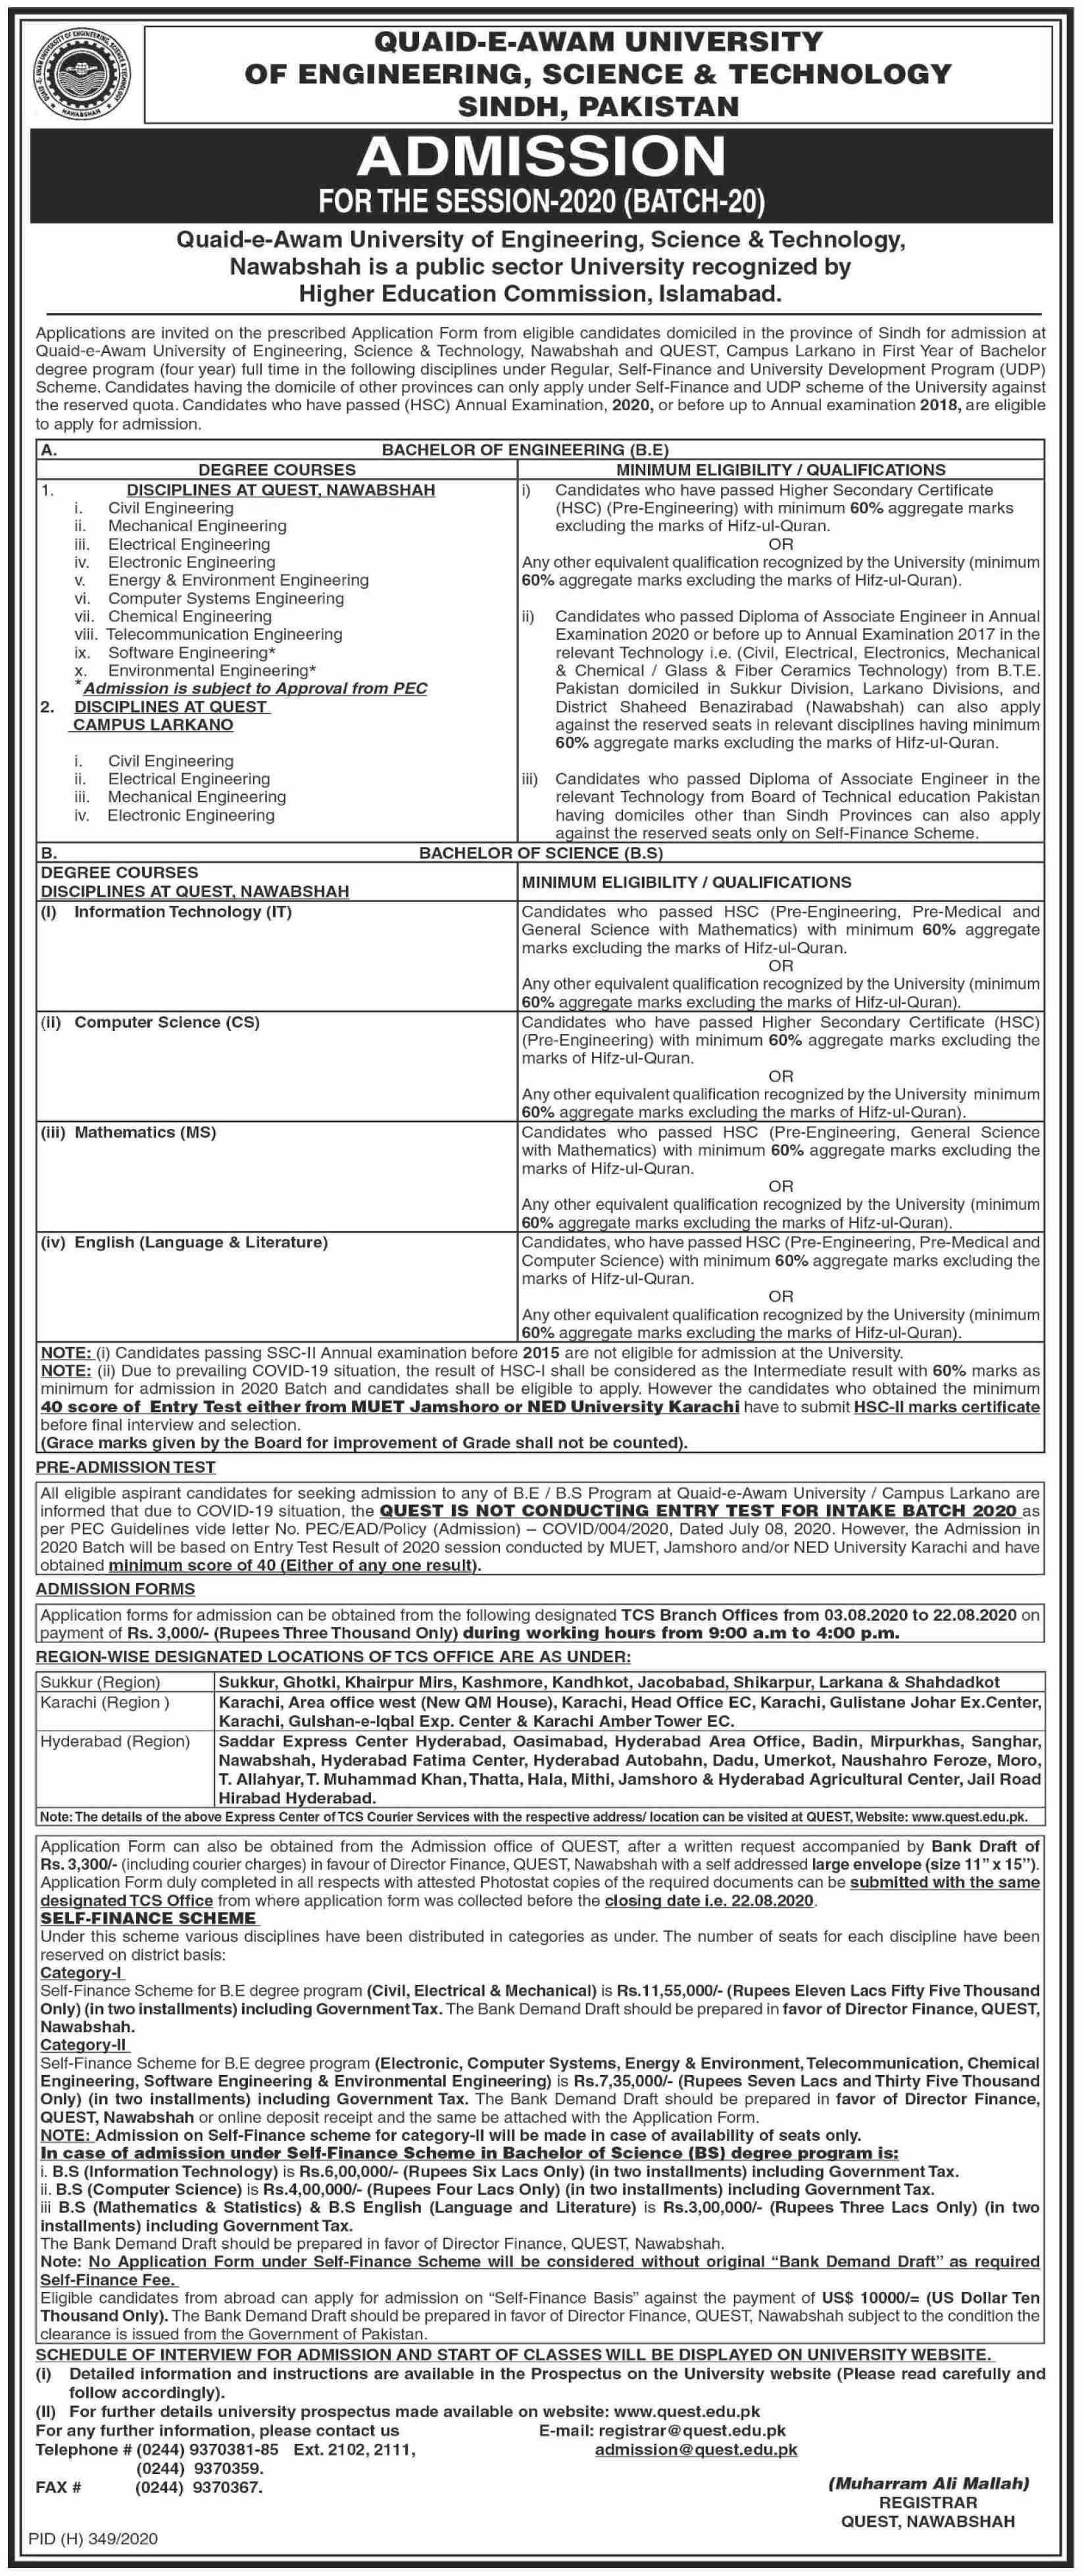 Quaid E Awam University Of Engineering Science & Technology Karachi Admissions